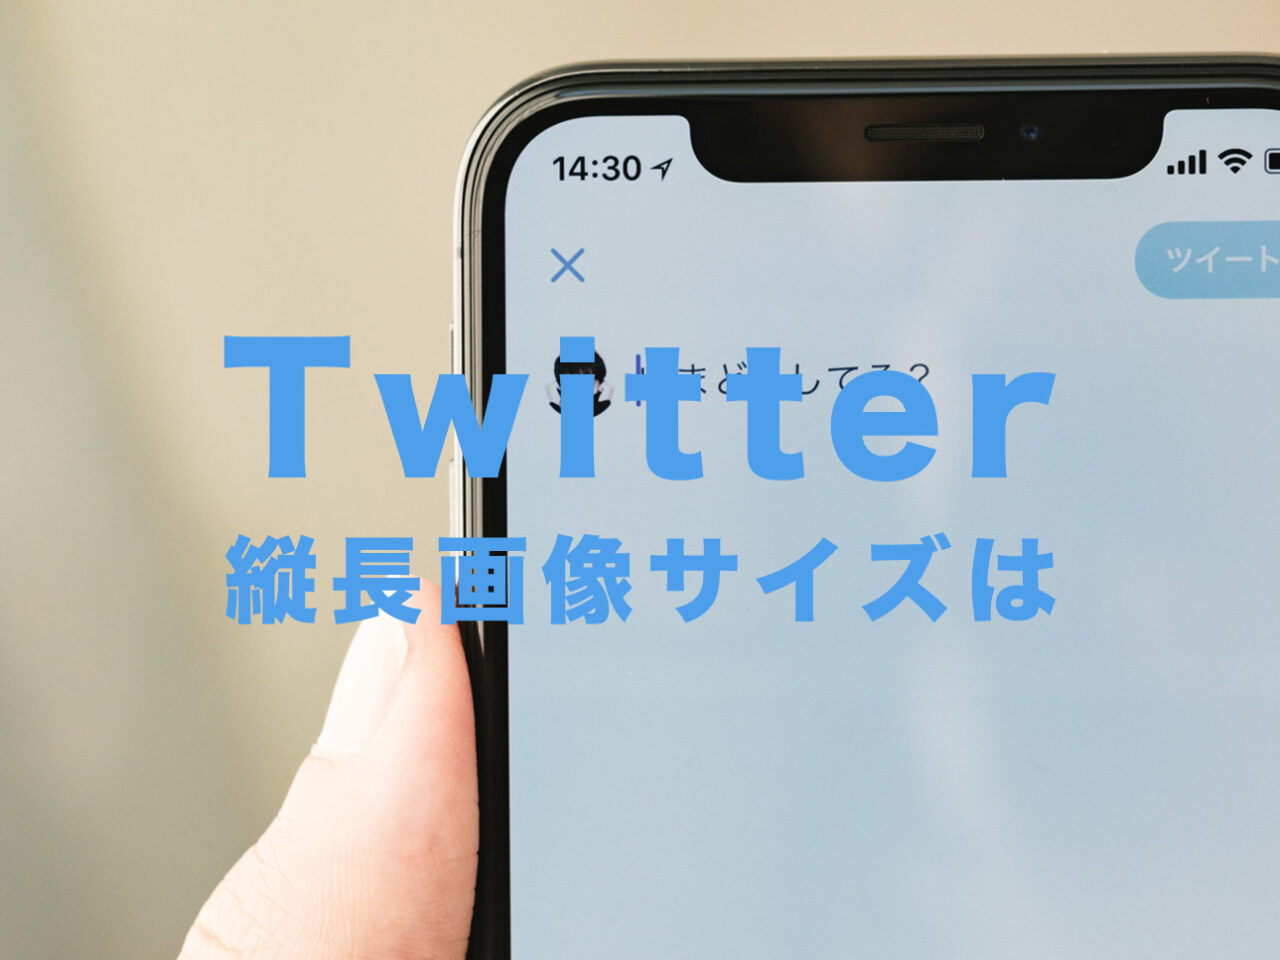 Twitter(ツイッター)で縦長画像の途切れないサイズや比率(アスペクト比)を解説!のサムネイル画像